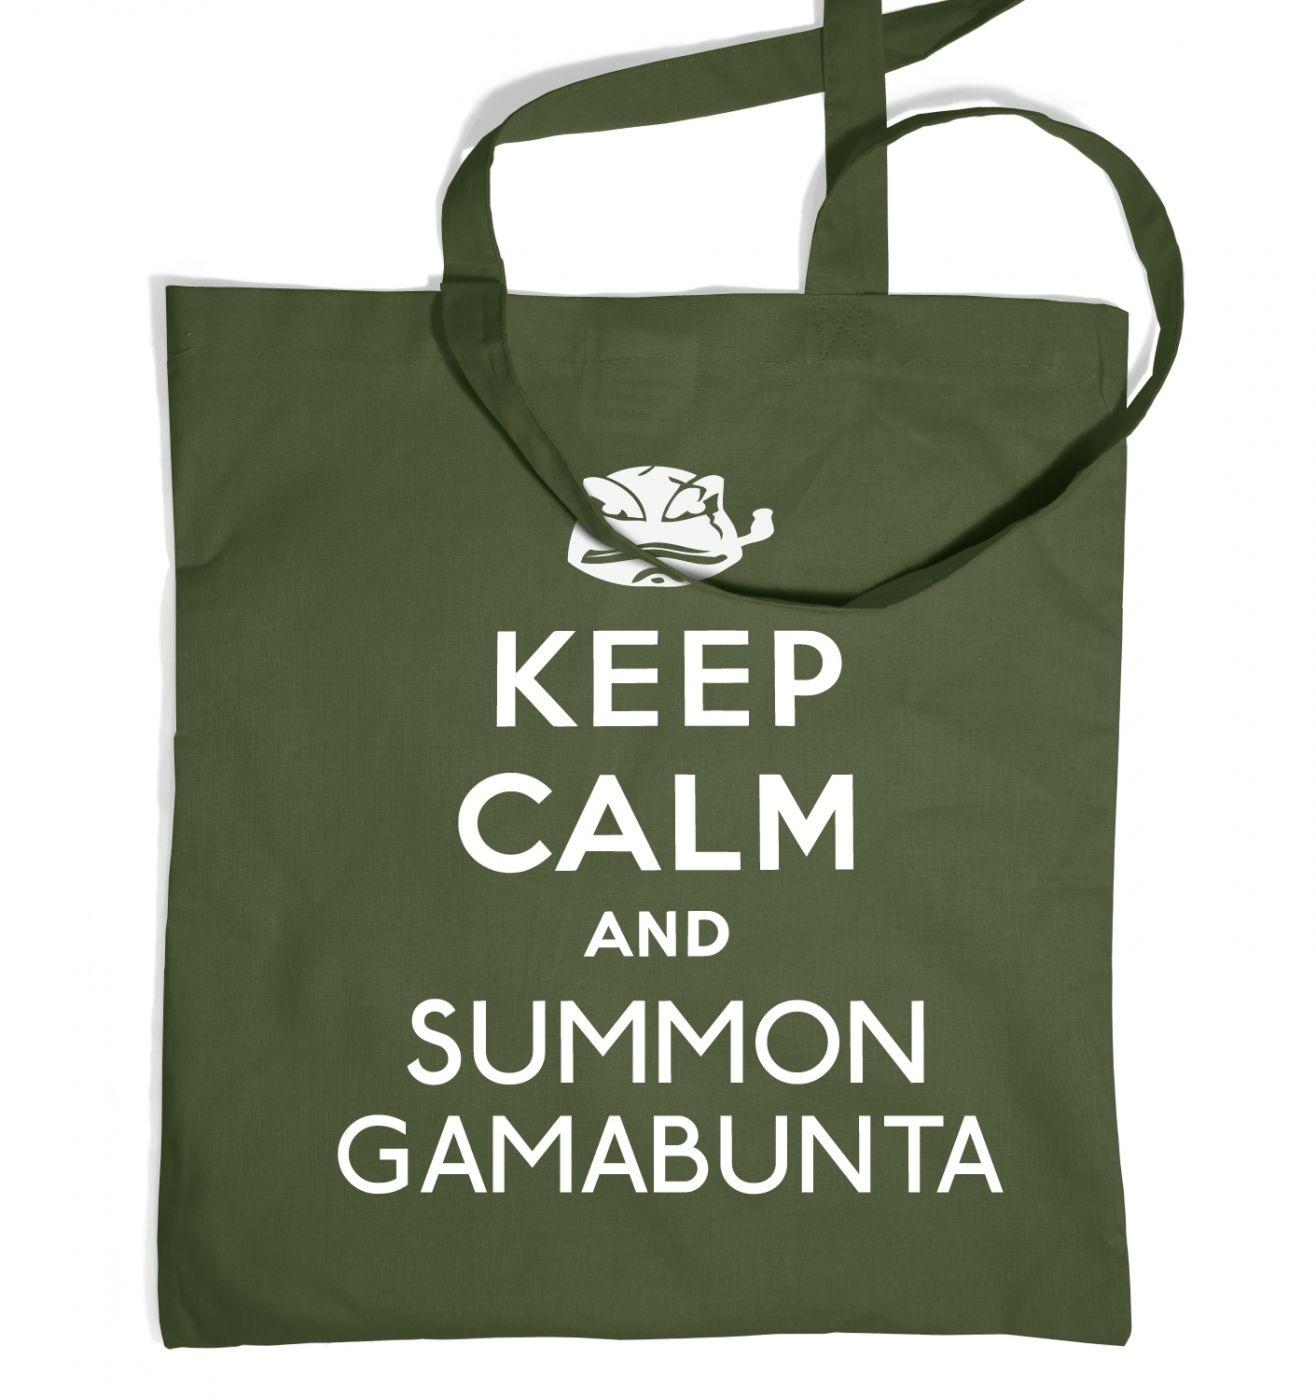 Keep Calm and Summon Gamabunta Tote Bag